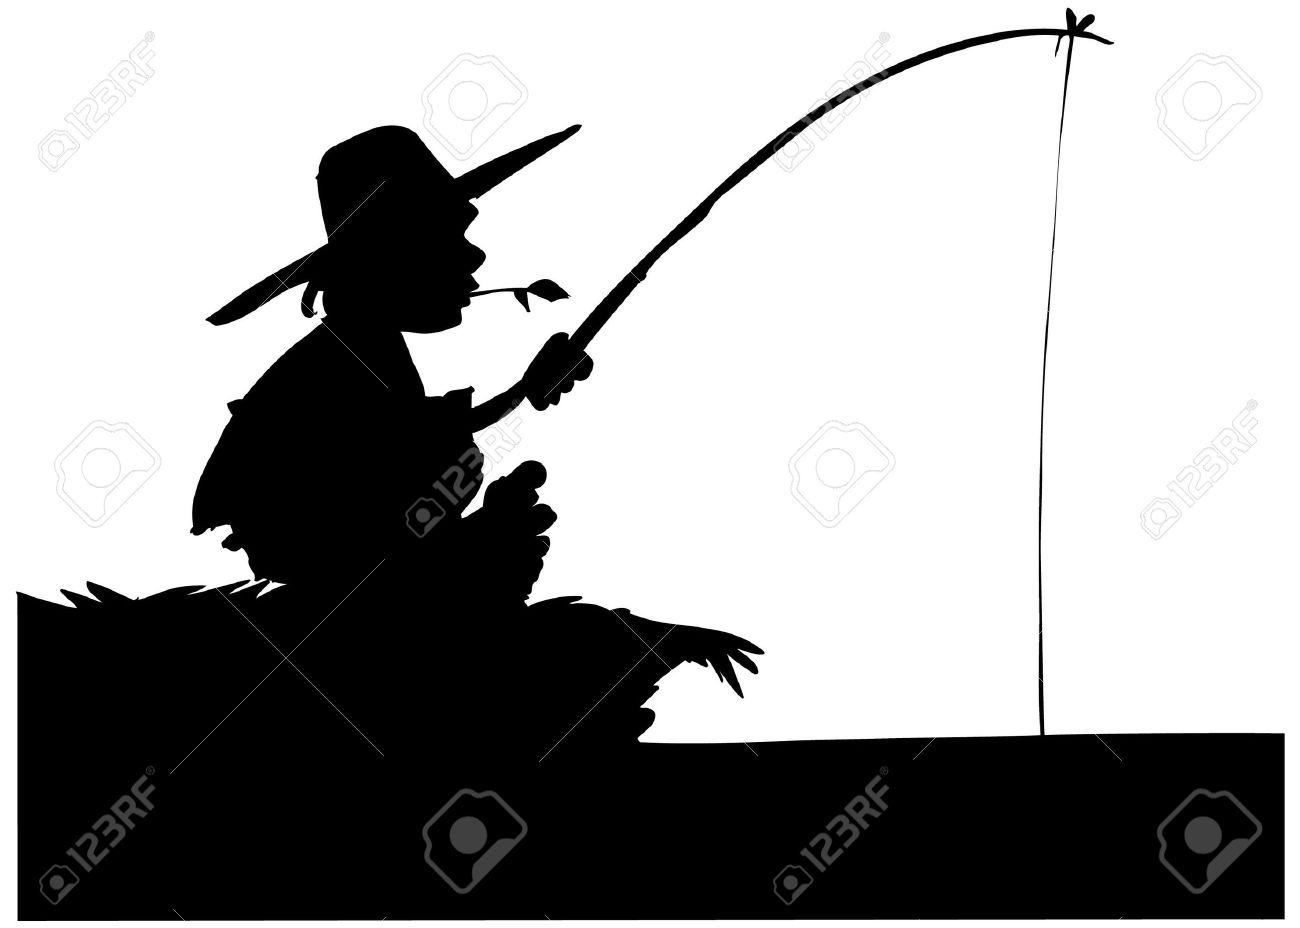 1300x928 Clip Art Silhouette Of Boy Fishing K3fib1l